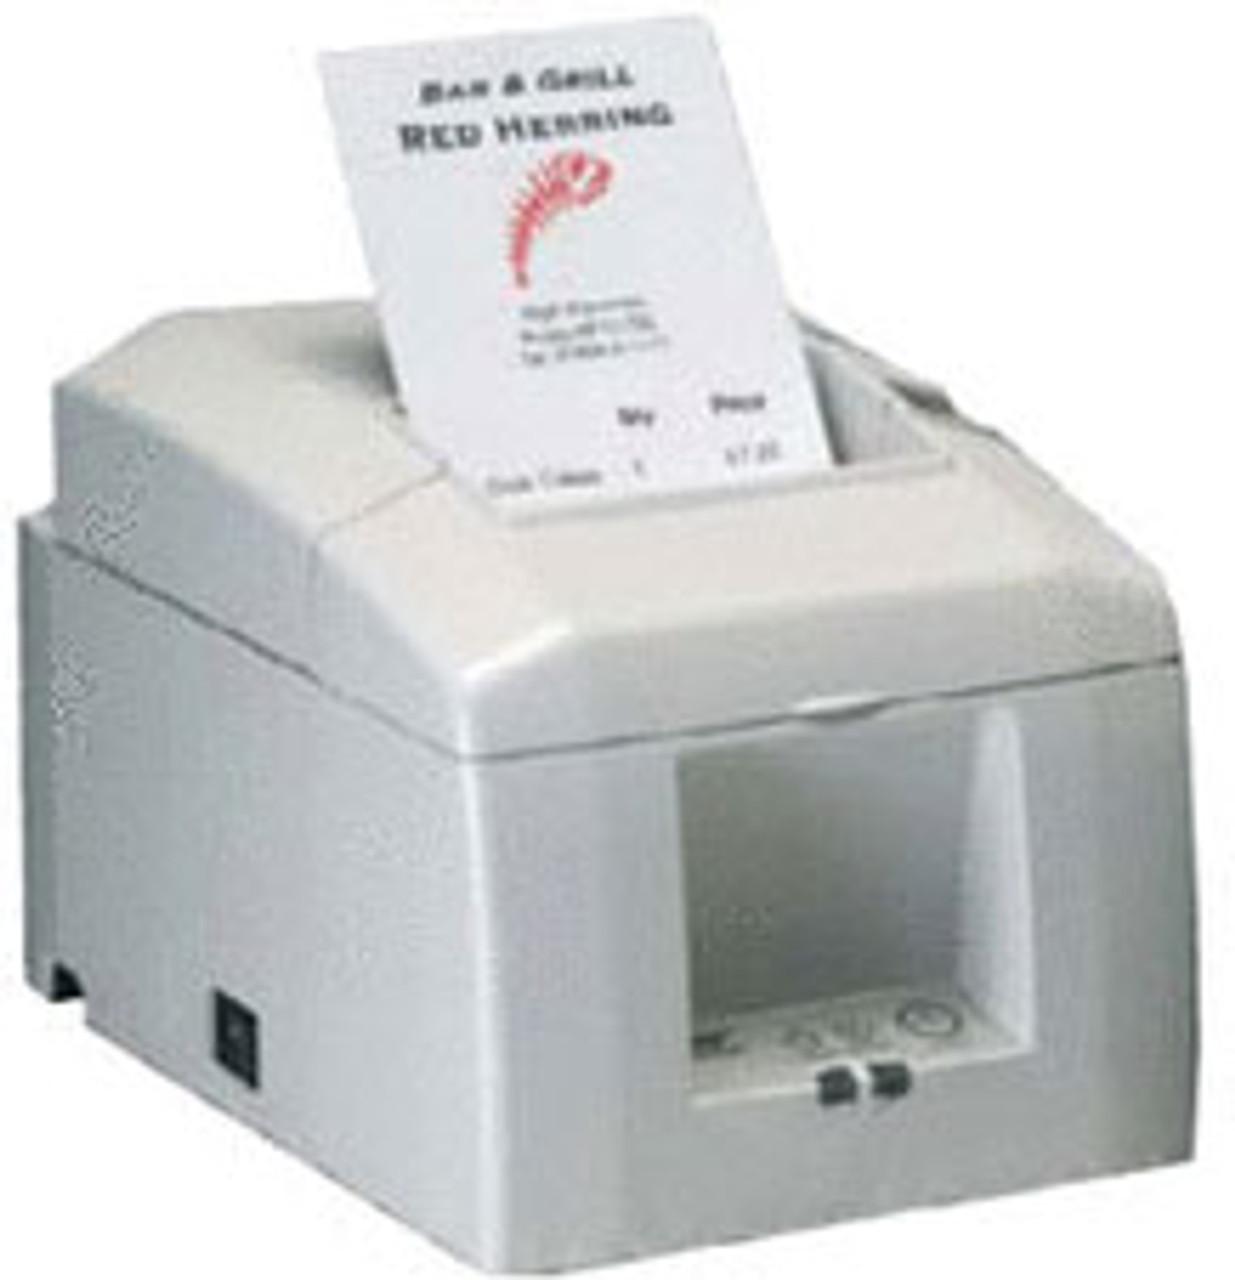 Star TSP650II POS Thermal Receipt Printer